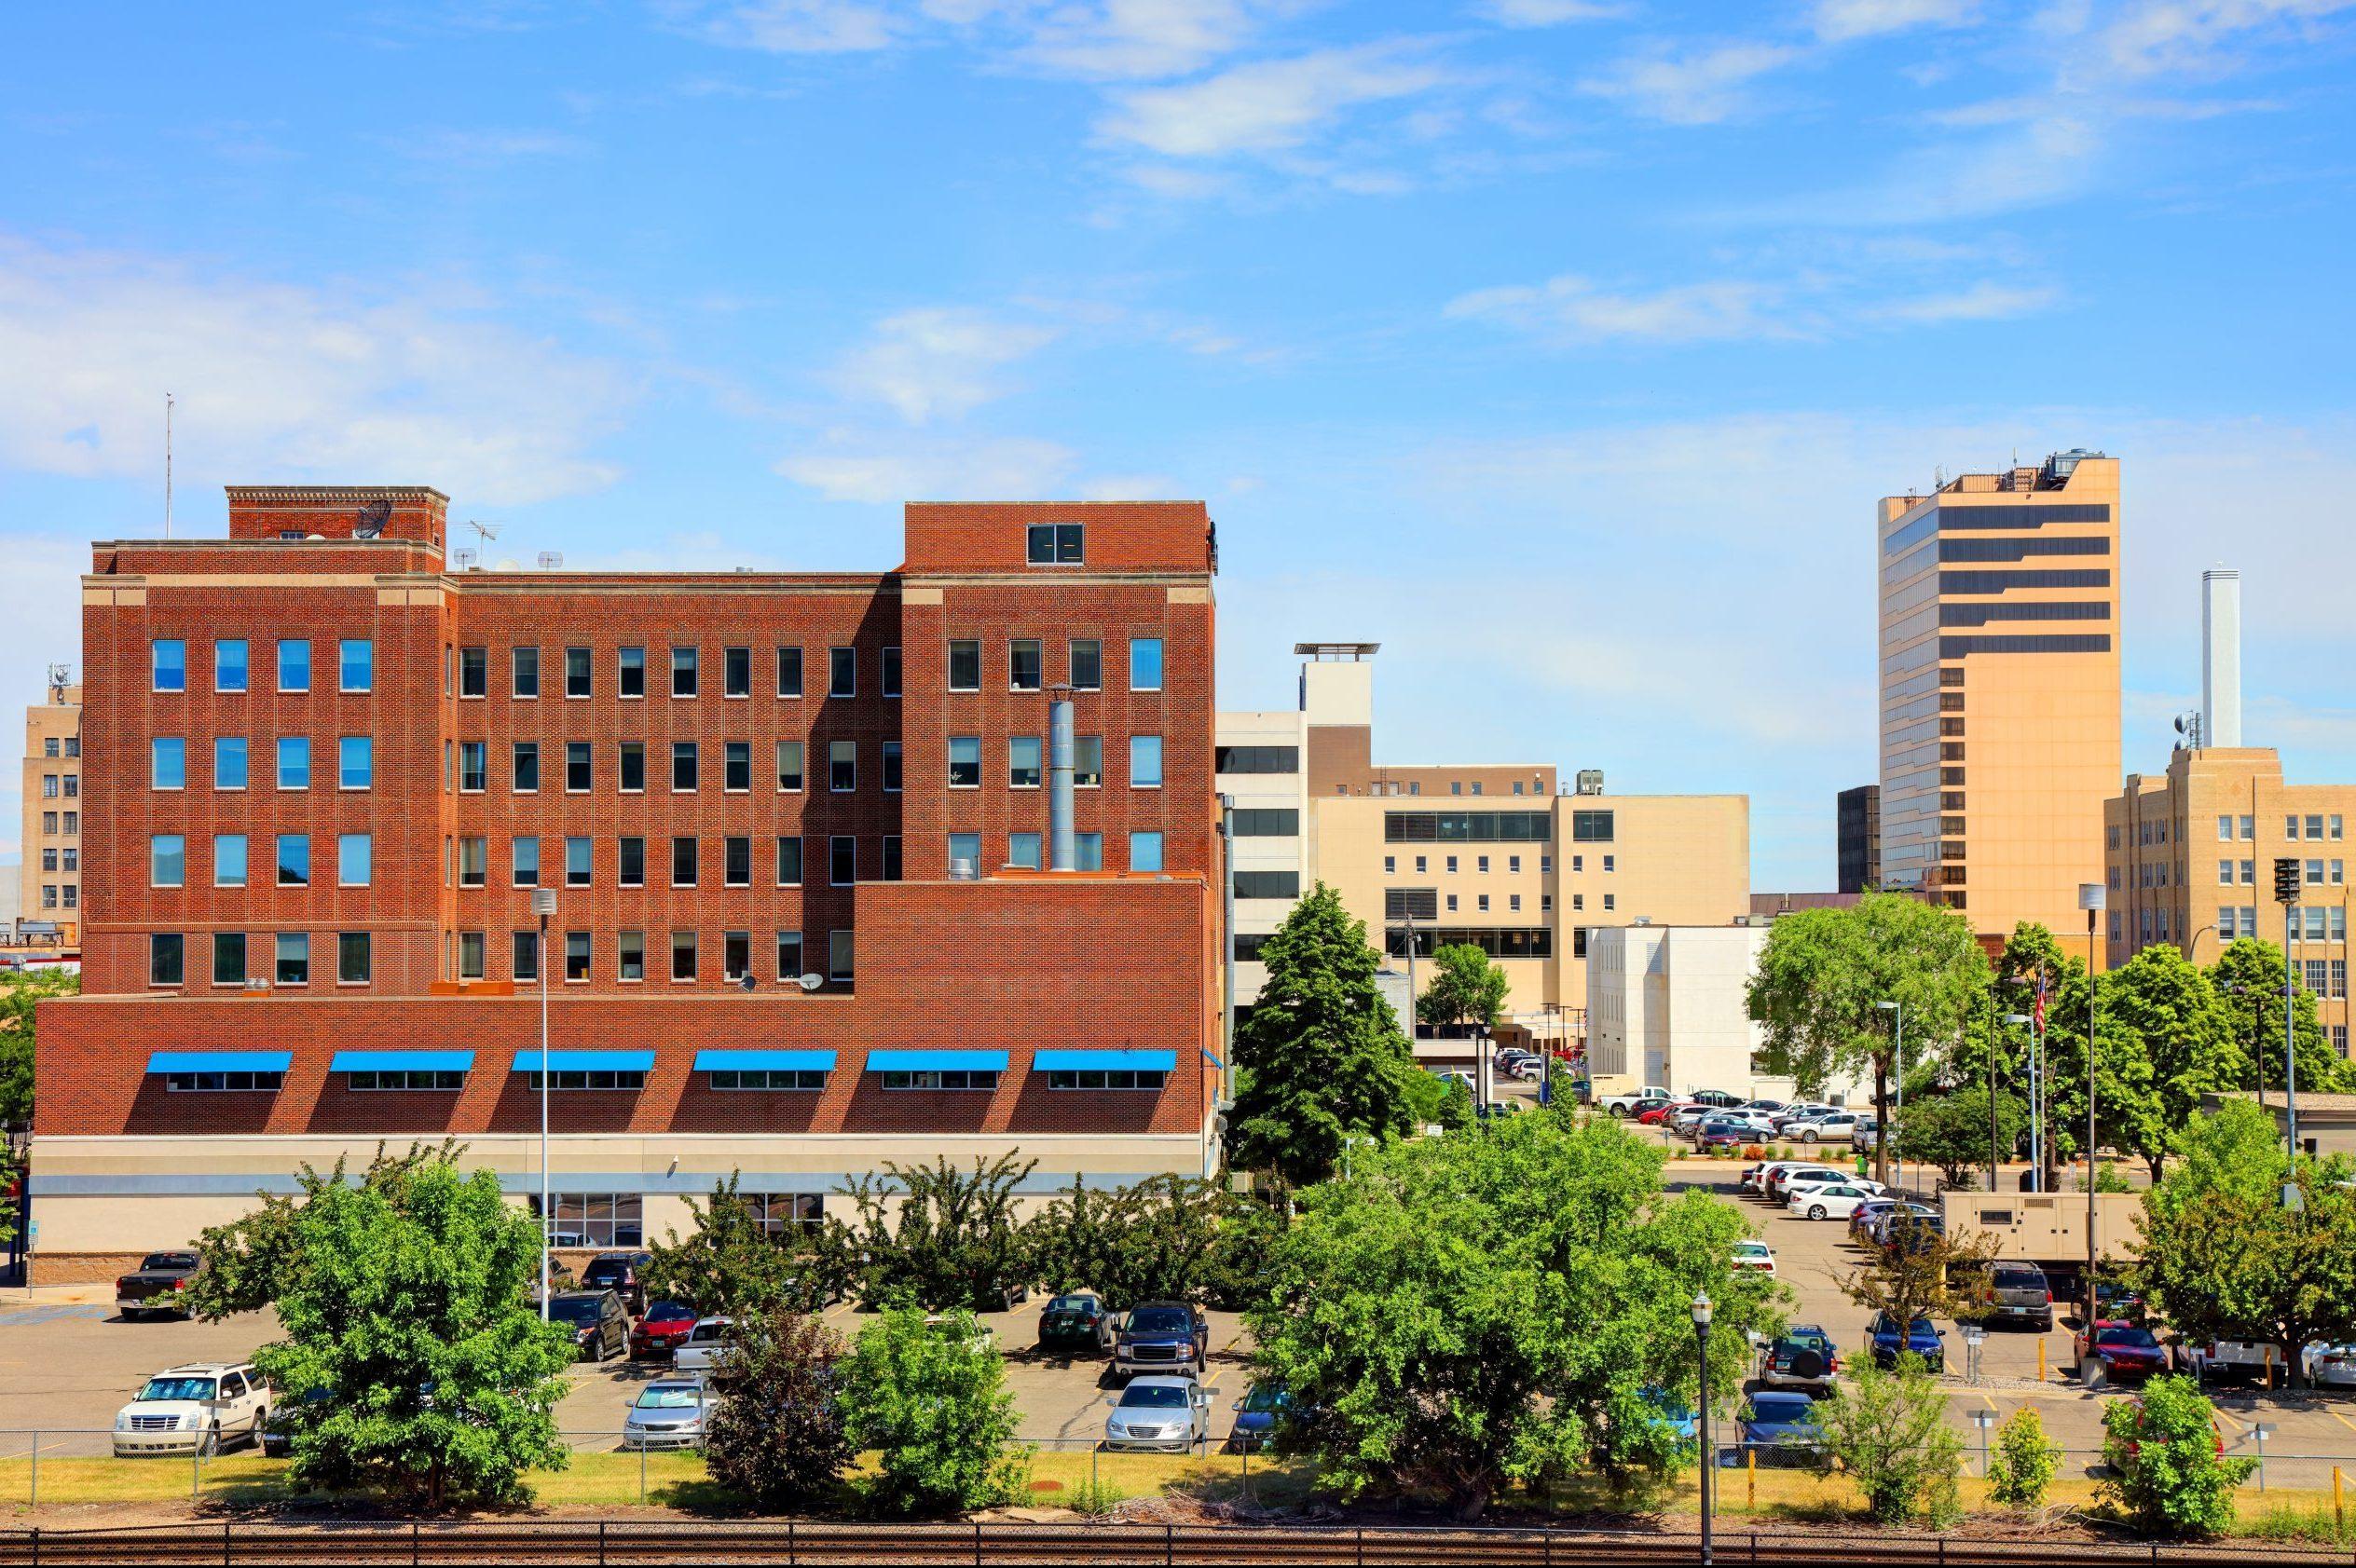 view of the city of Fargo, North Dakota